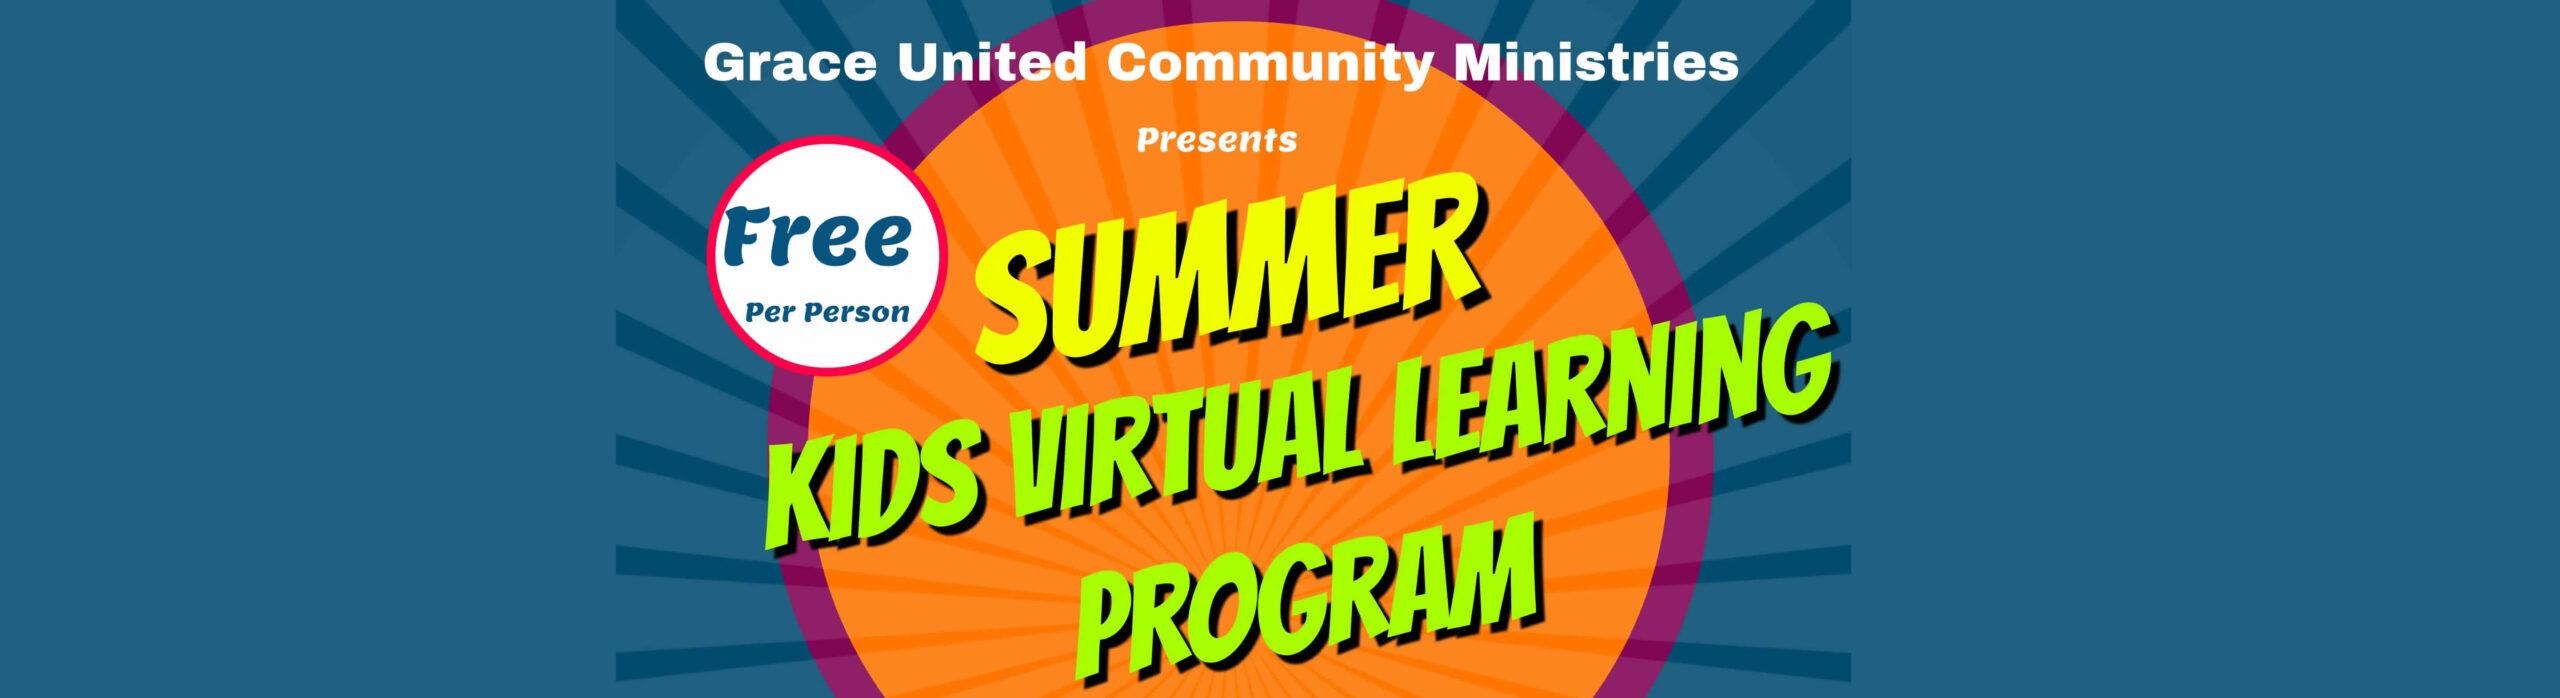 Kids Summer Camp Flyer 2020 banner